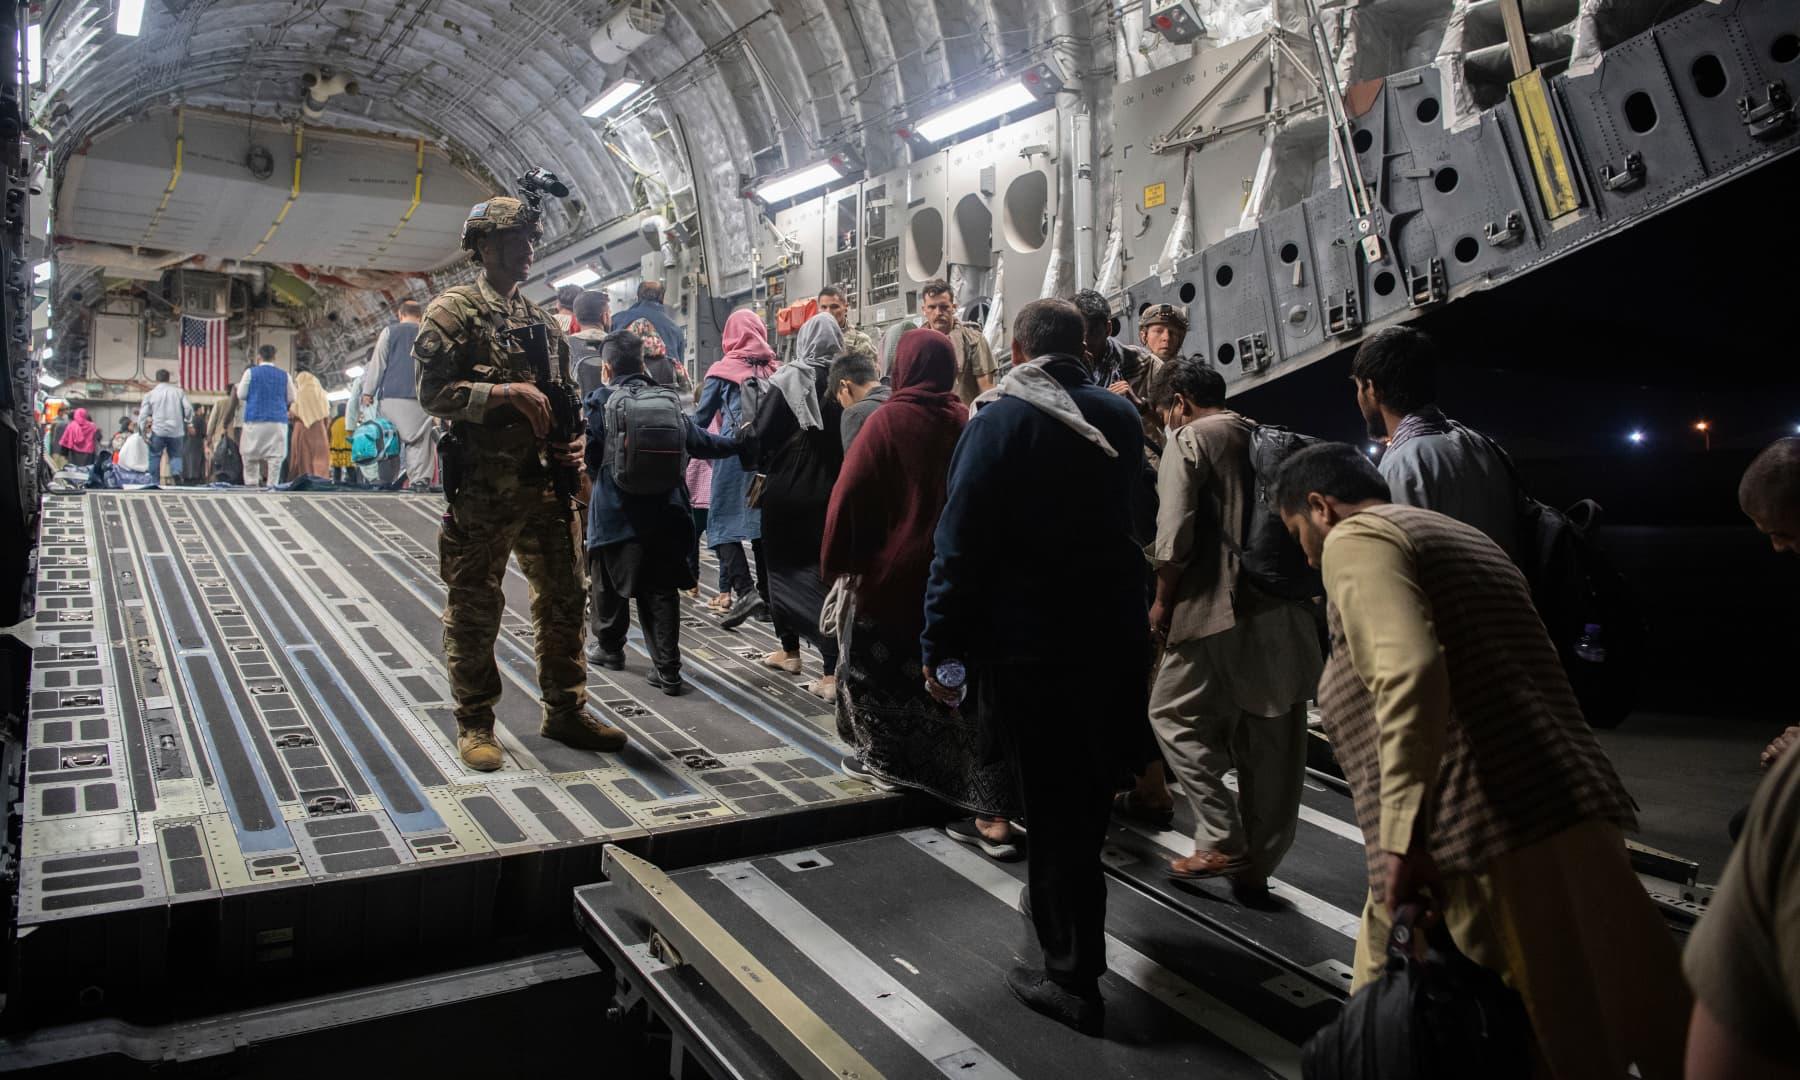 Afghan passengers board a US Air Force C-17 Globemaster III during the Afghanistan evacuation at Hamid Karzai International Airport in Kabul, Afghanistan on August 22, 2021. — AP